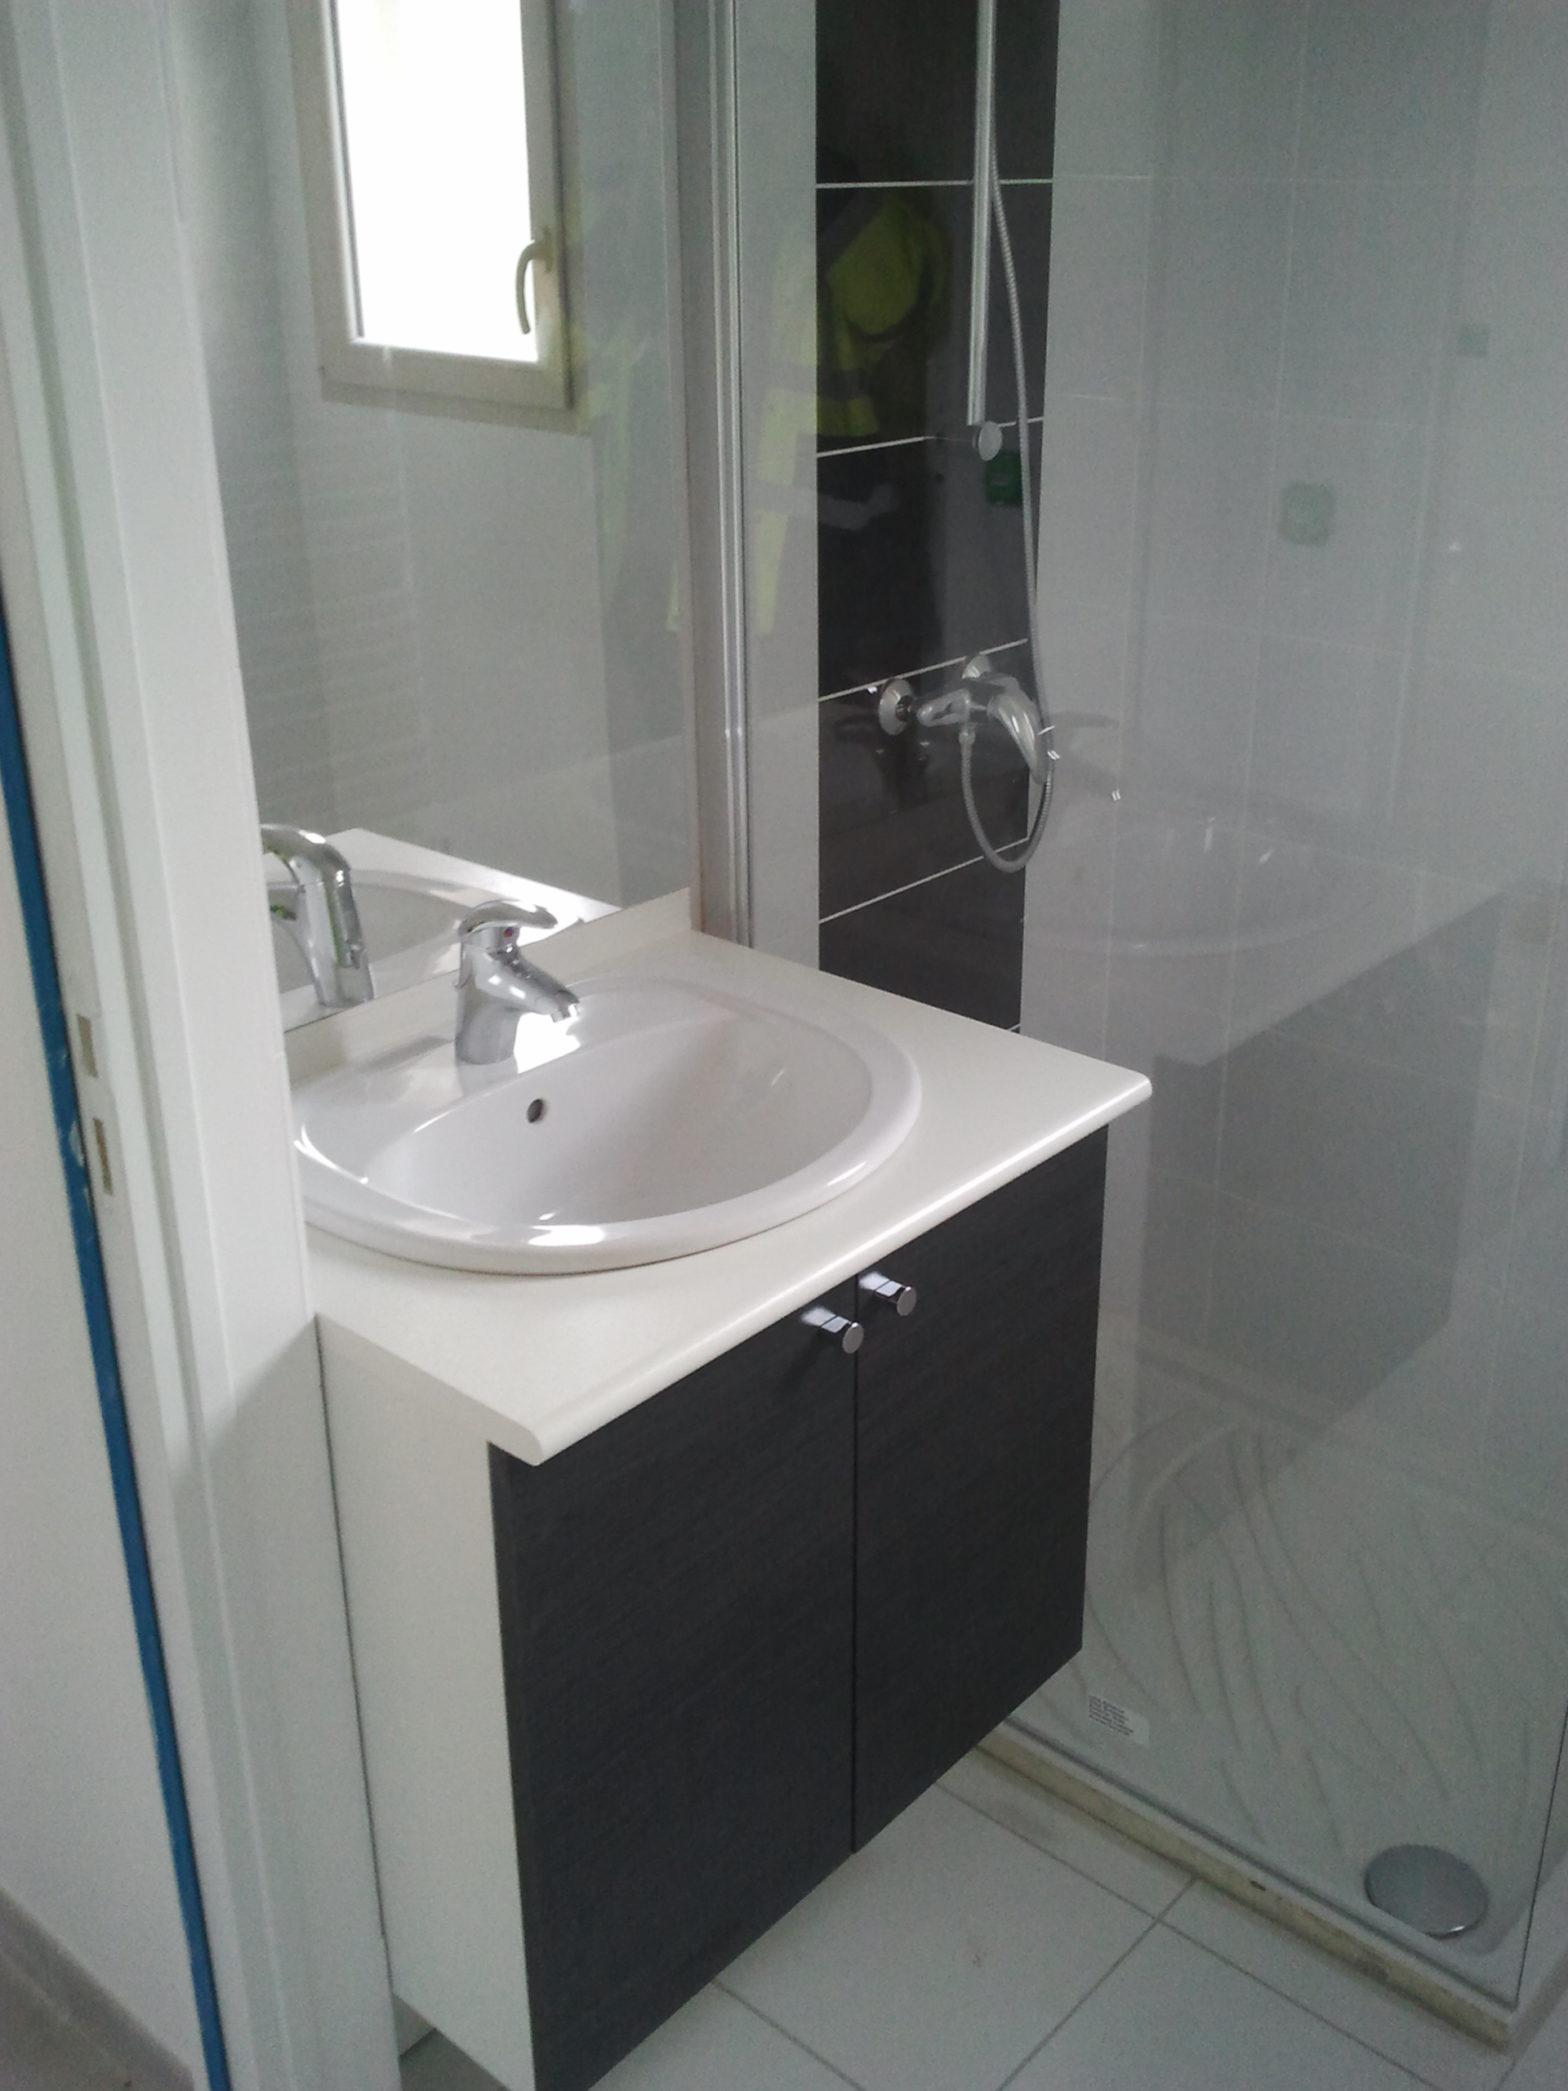 sanitaire-faience-meuble-cedeo-49800-sarrigne